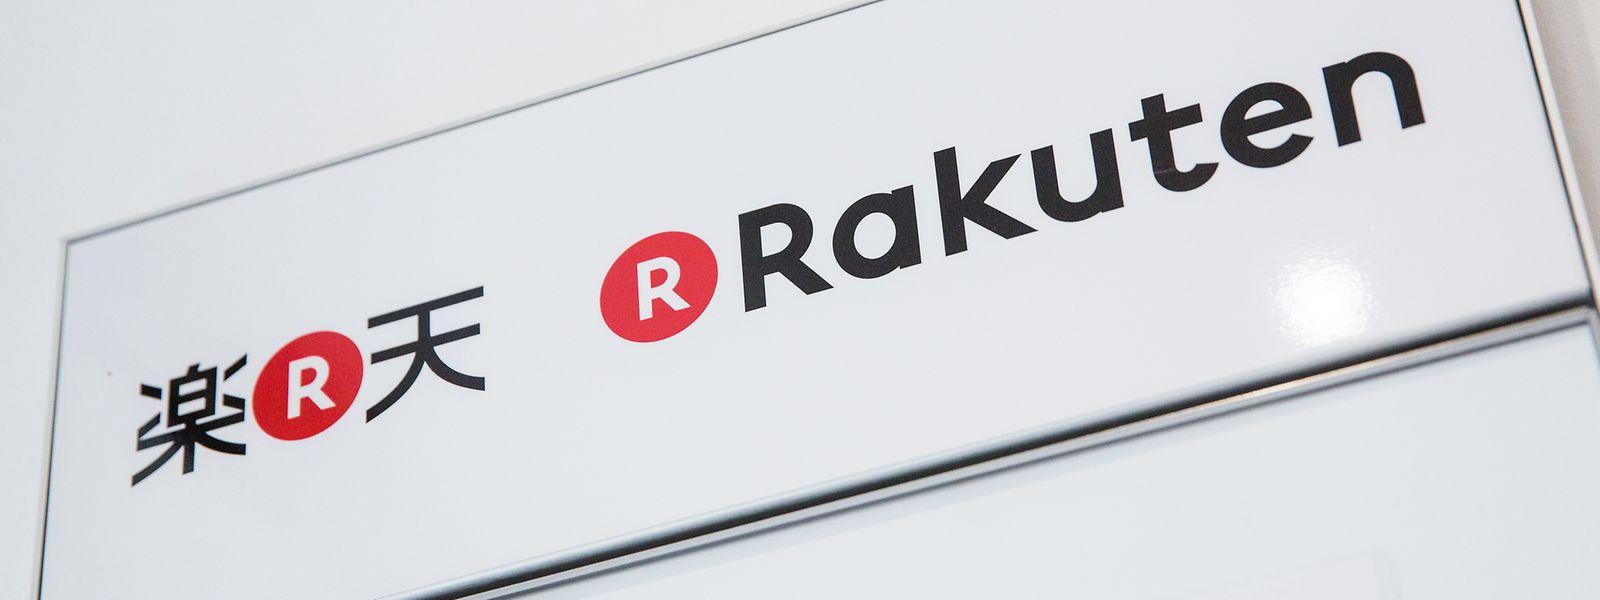 O Rakuten Europe Bank tem atualmente sede no Luxemburgo.